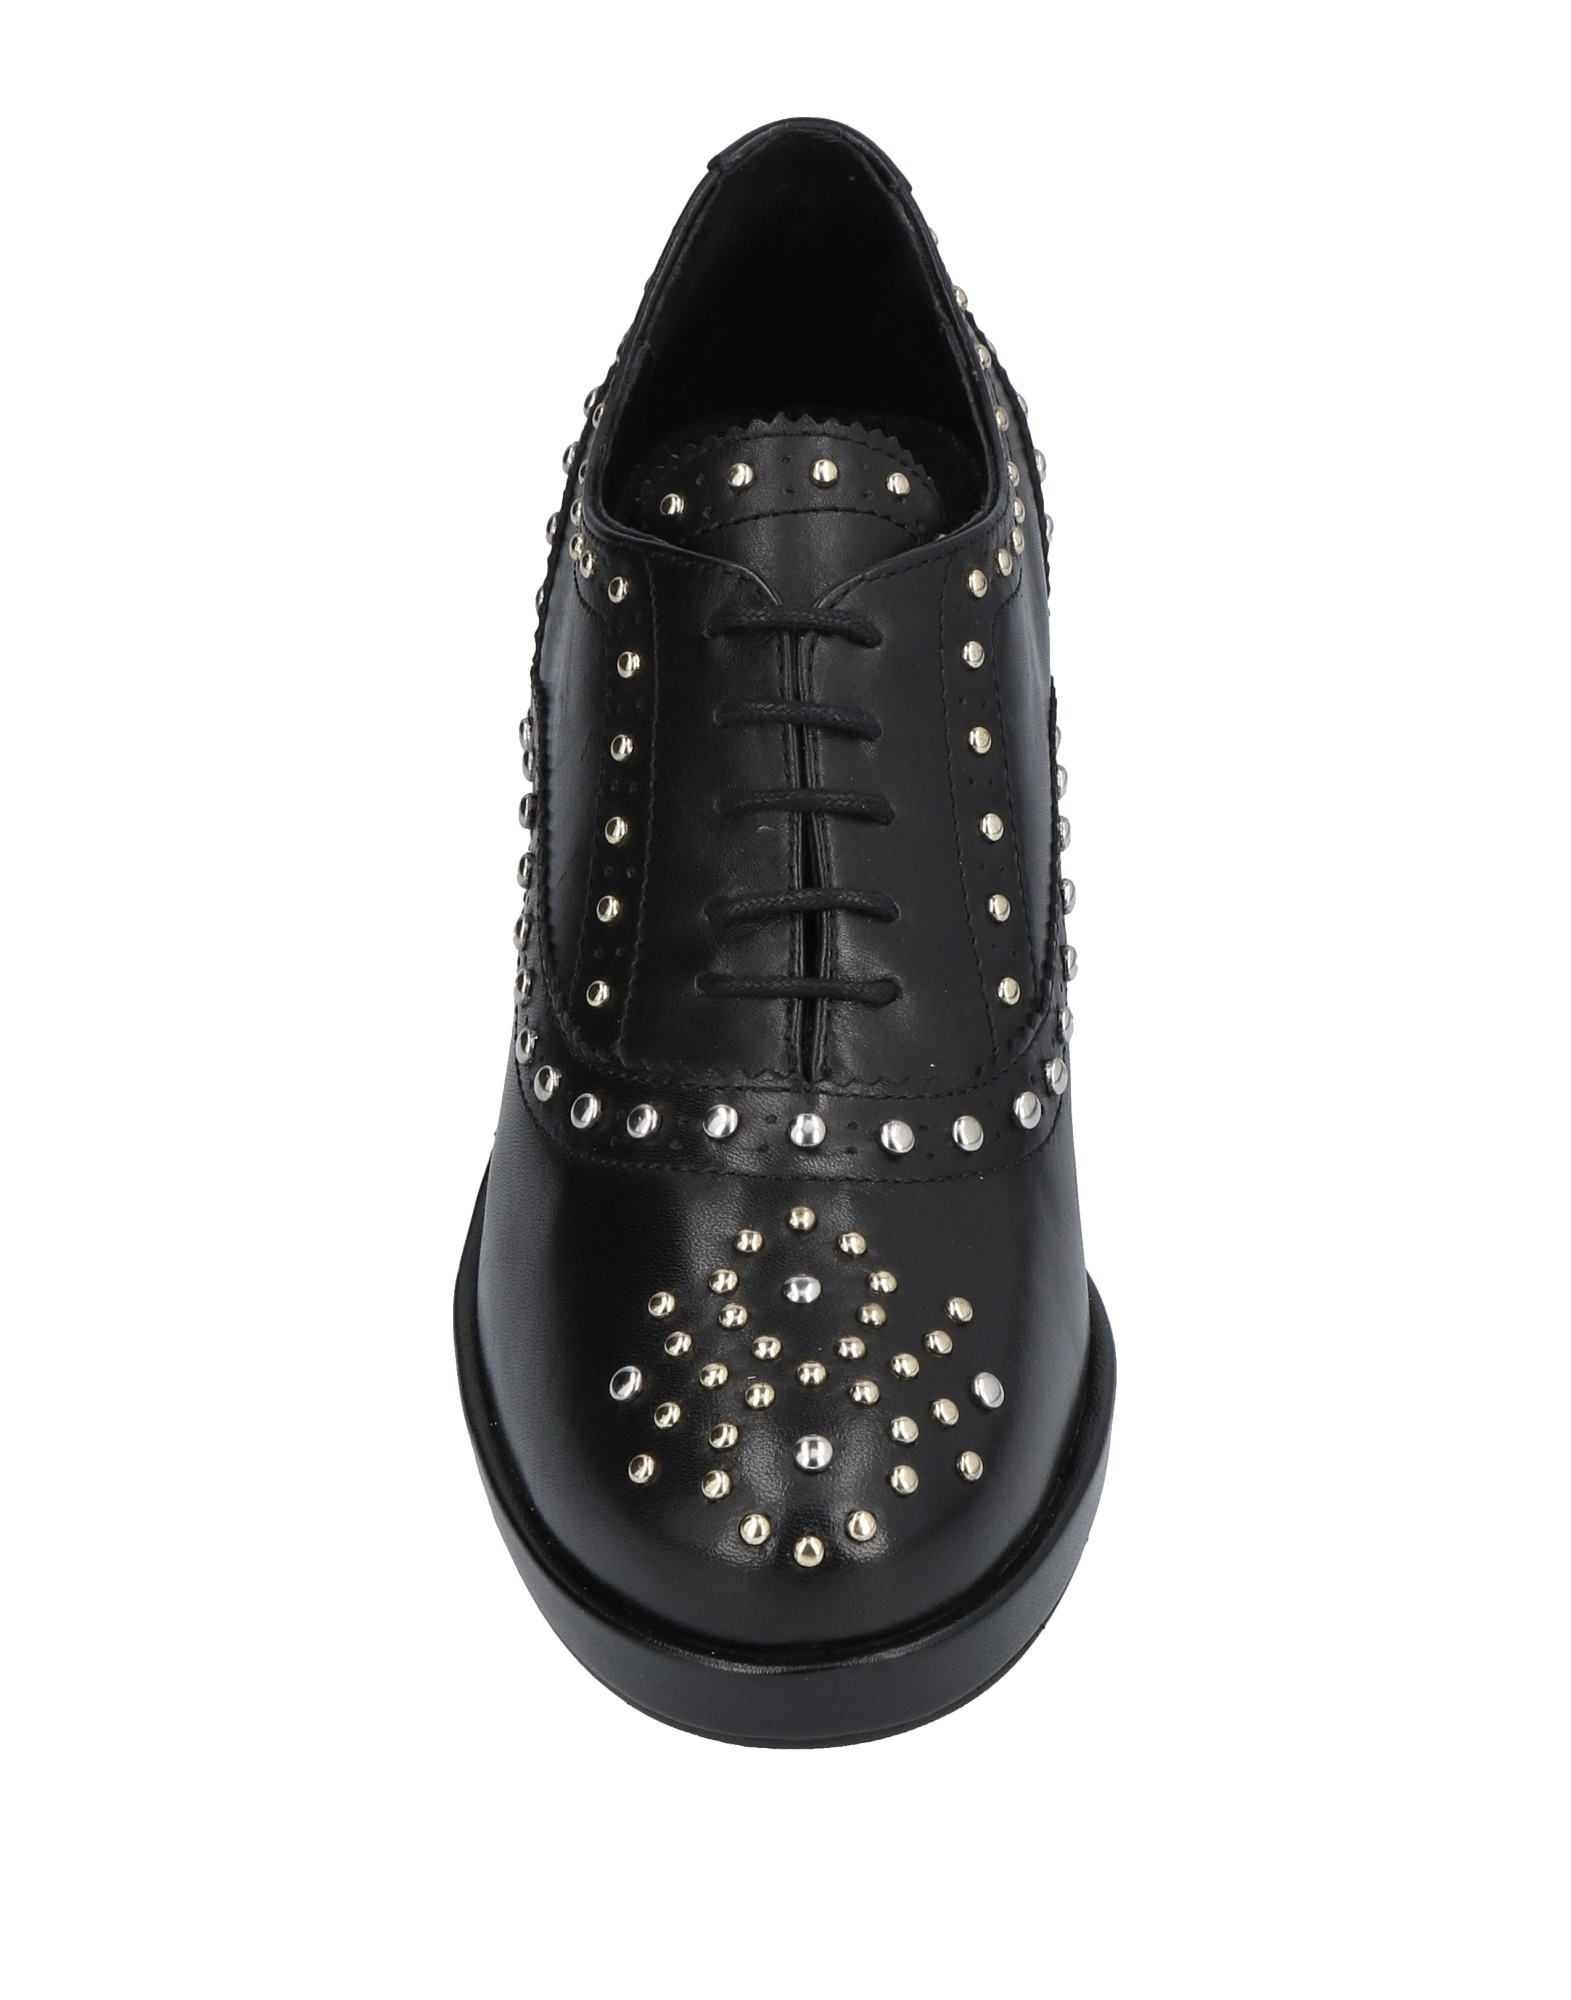 Gut um billige Damen Schuhe zu tragenBruno Premi Schnürschuhe Damen billige  11455750CQ 8877ad